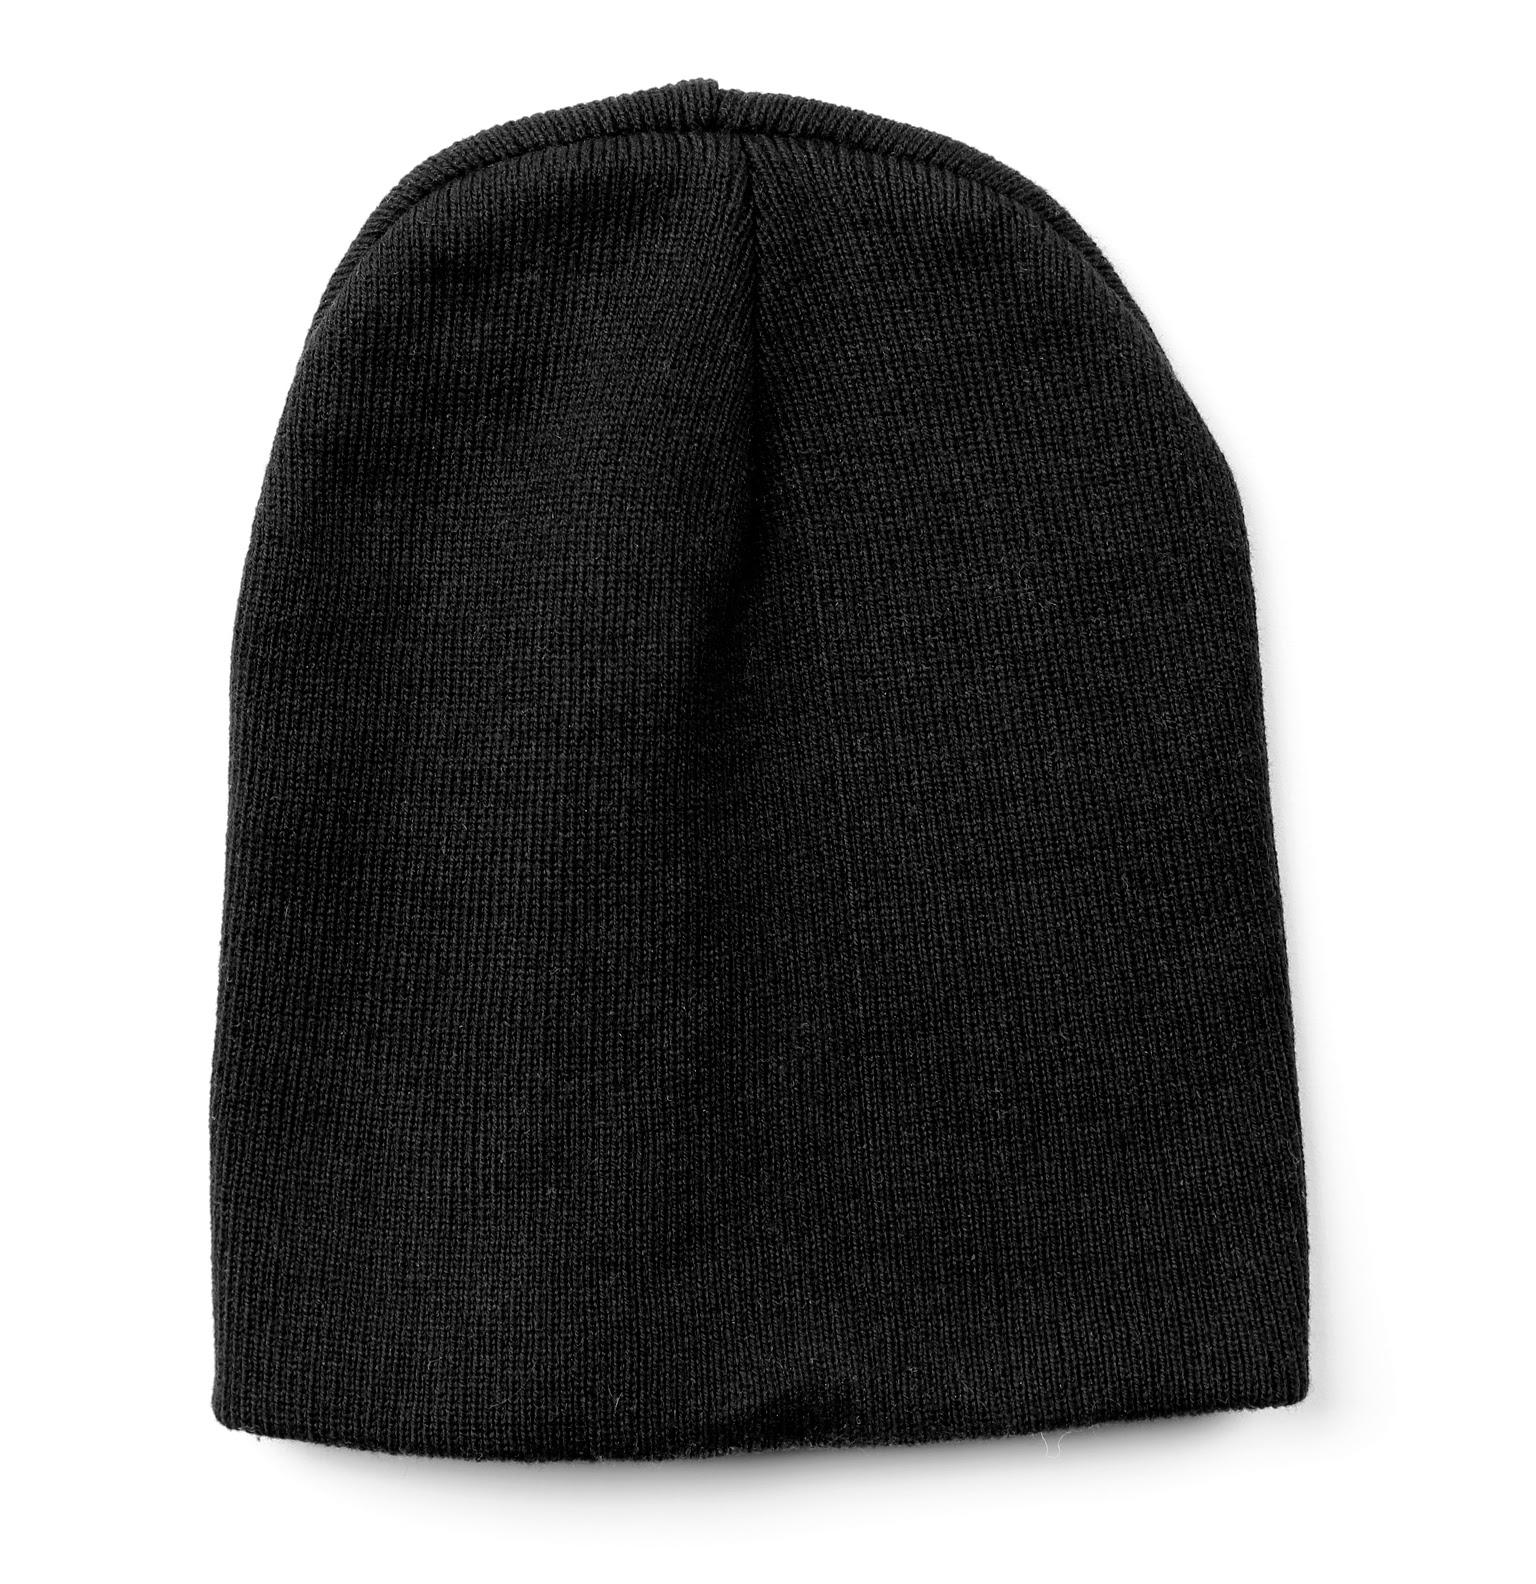 Black Skull Cap Beanie